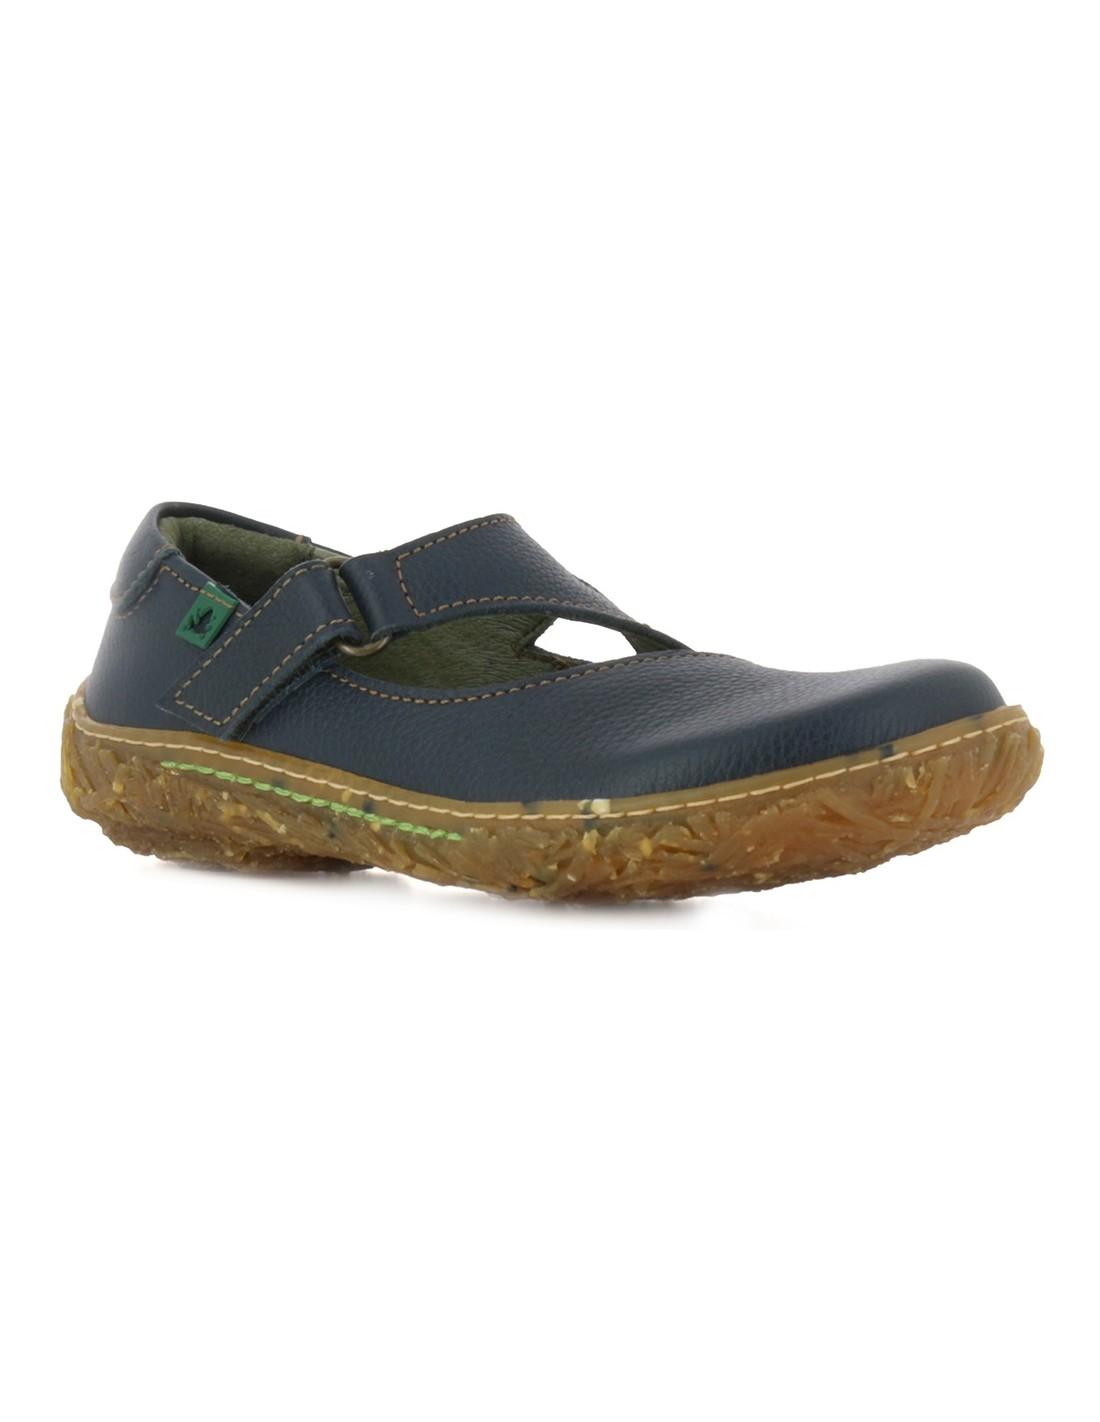 56c72d8a El Naturalista zapato NIDO E751- lila,marrón. Loading zoom